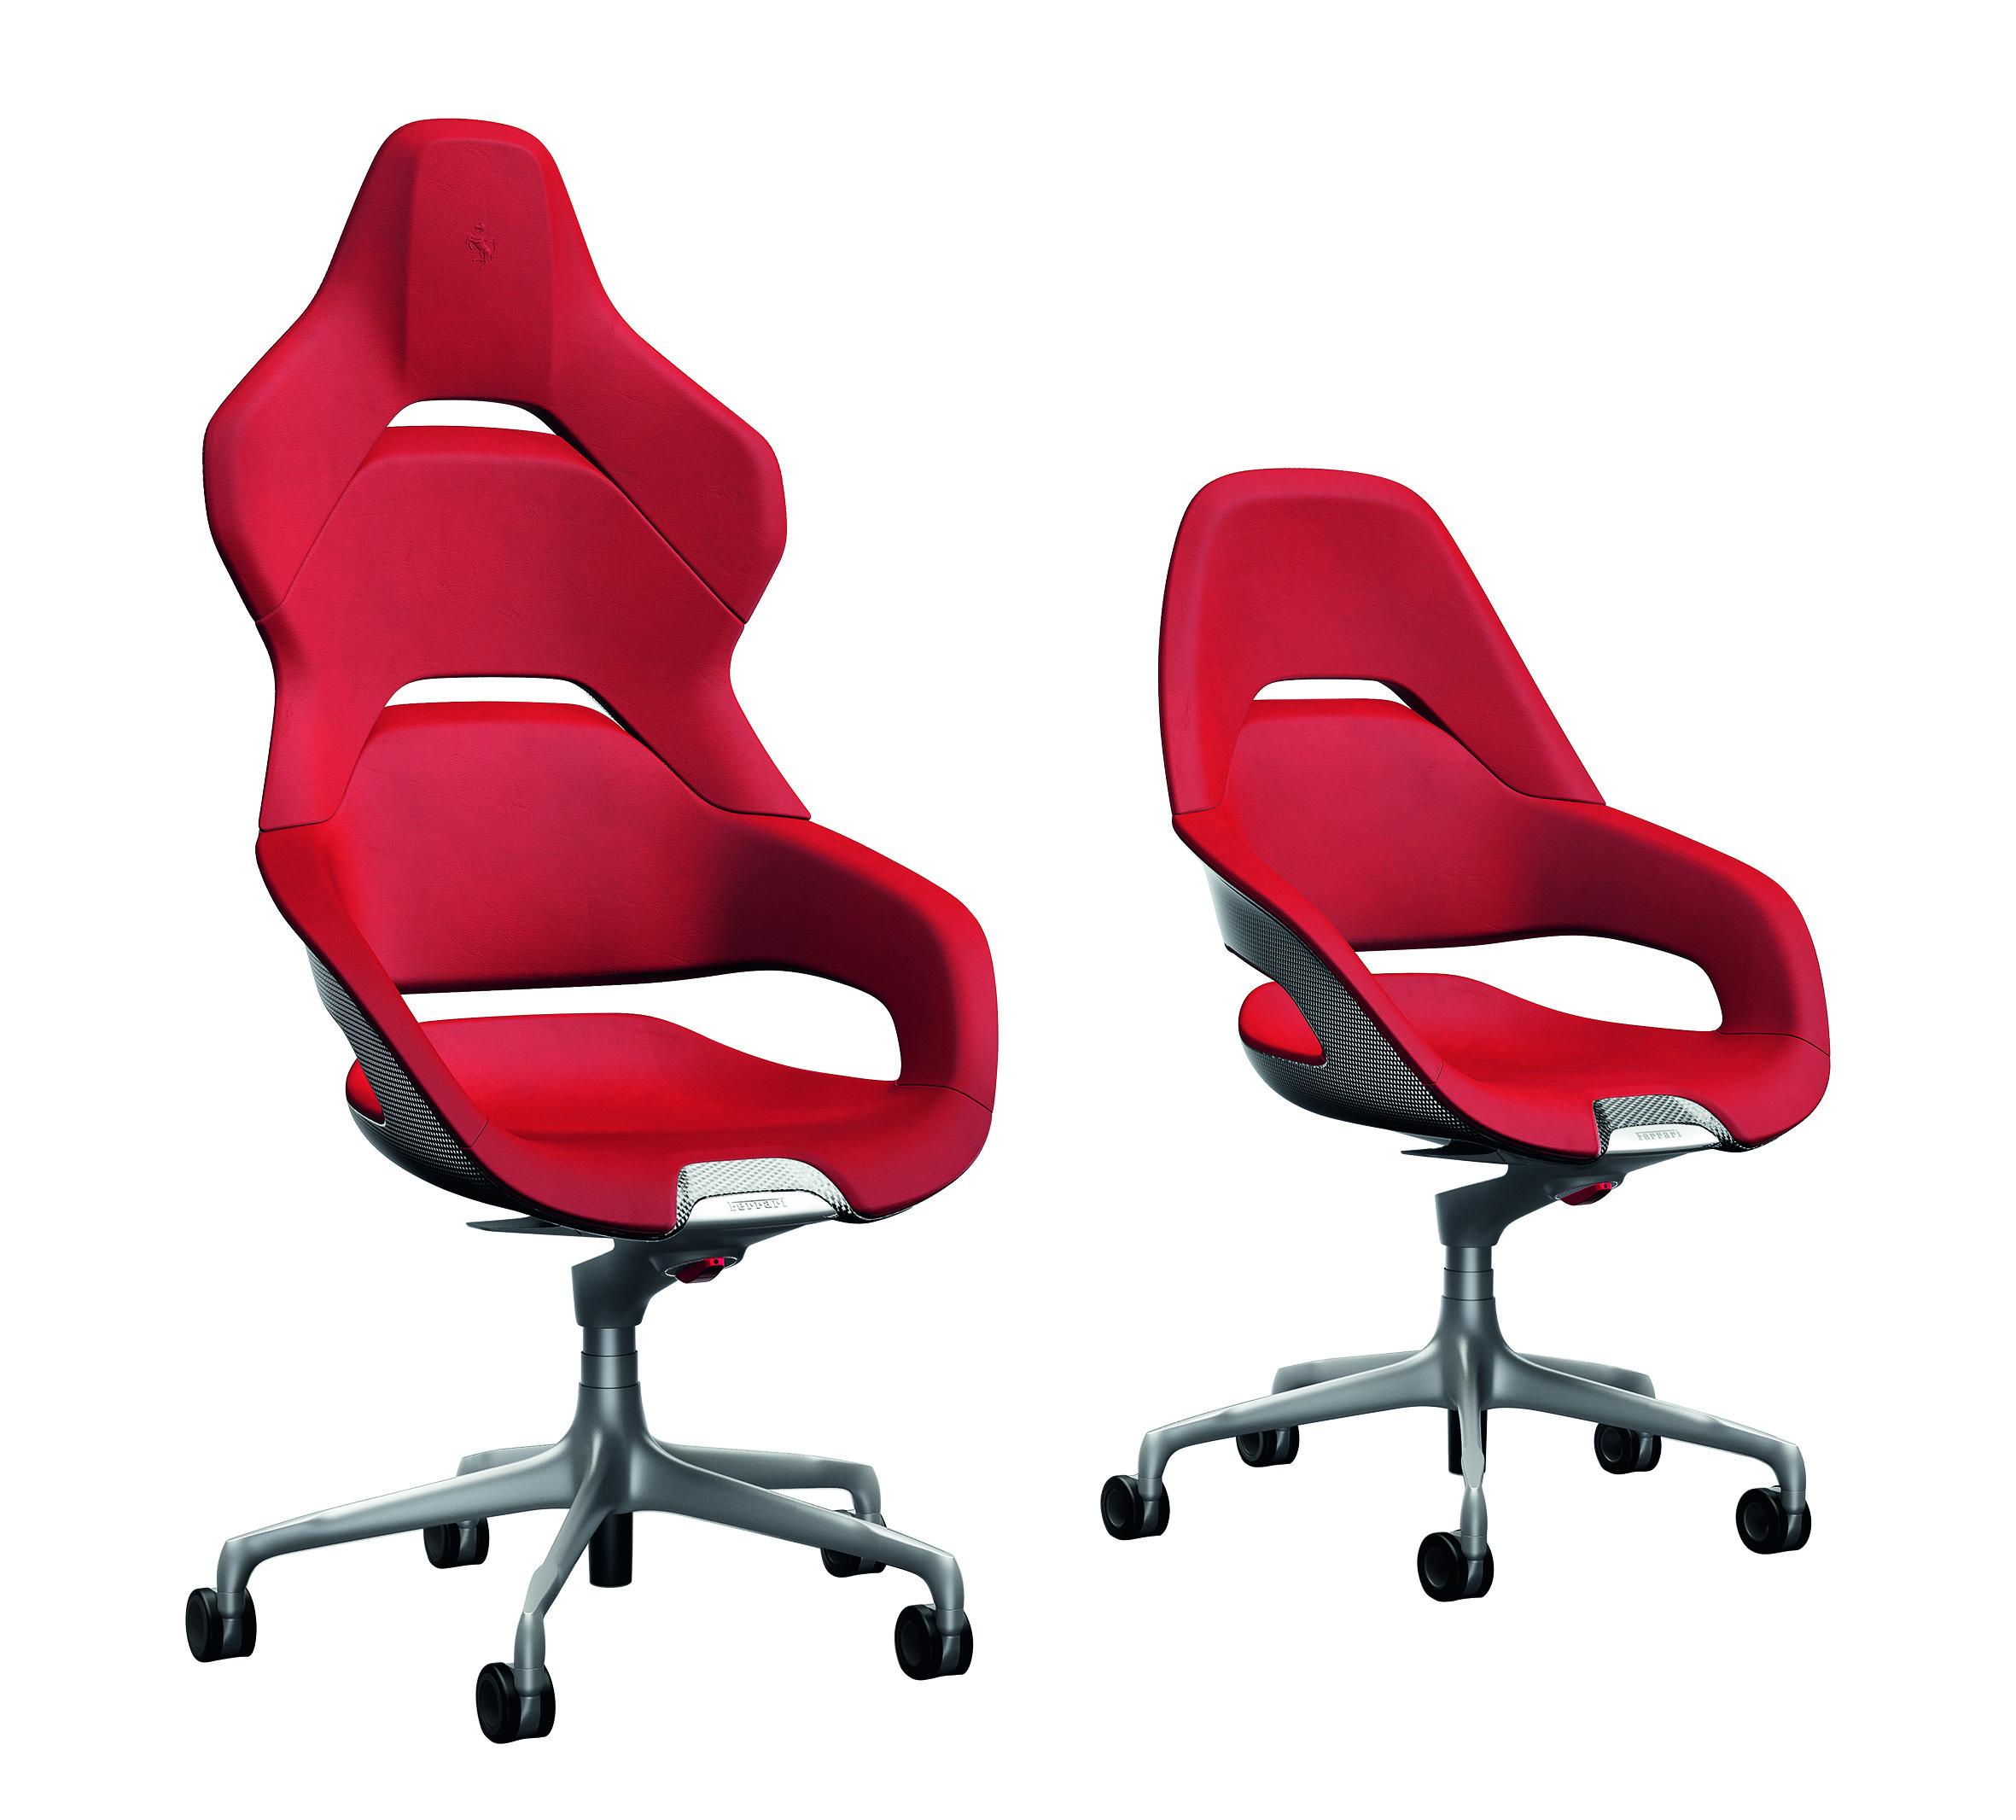 Poltrona.Ferrari And Poltrona Frau Launch Limited Edition Cockpit Chair